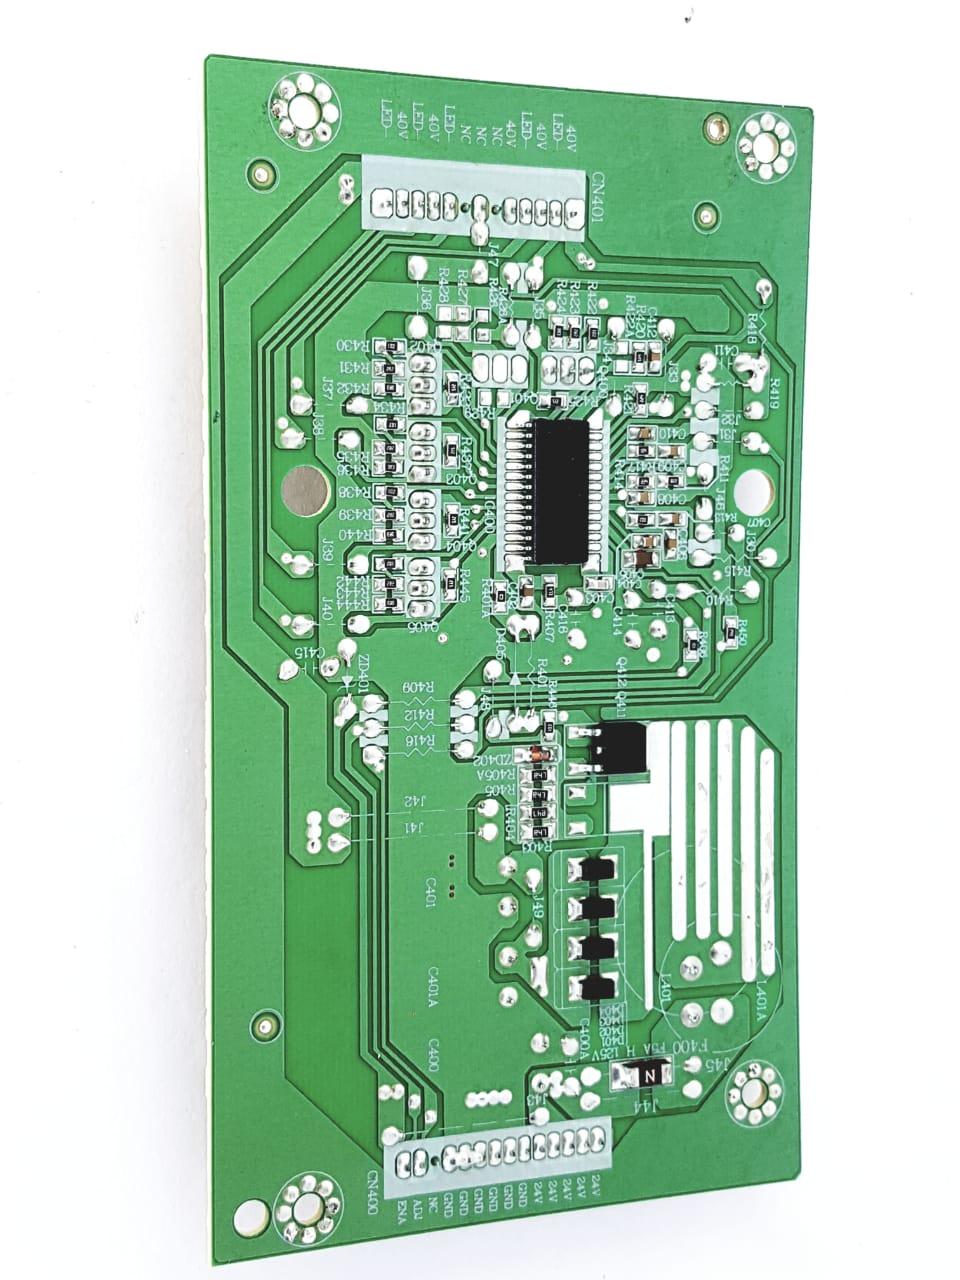 Placa Inverter Tv Semp Toshiba Le3973 original 168P